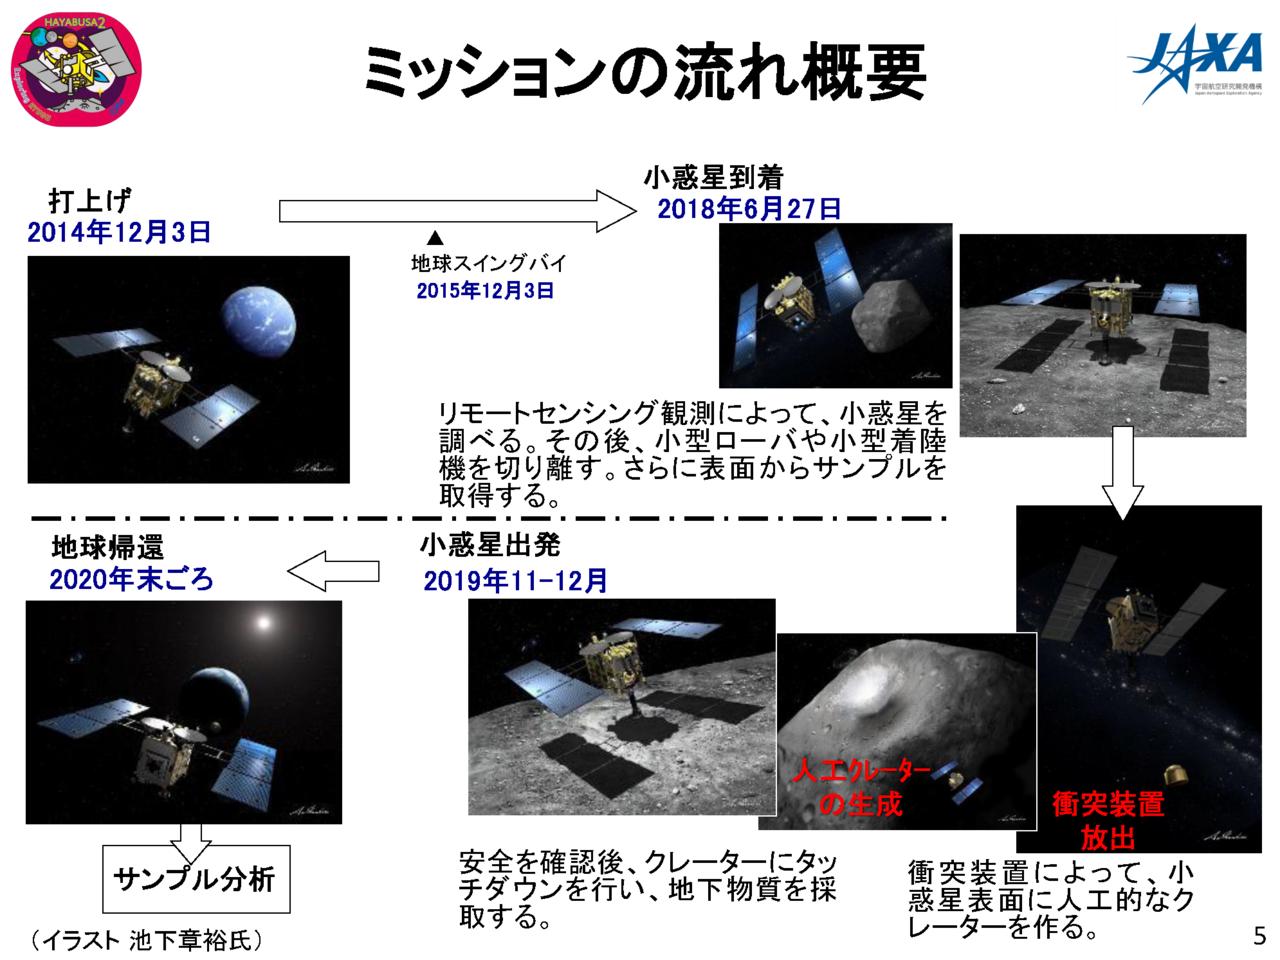 f:id:Imamura:20180719131700p:plain